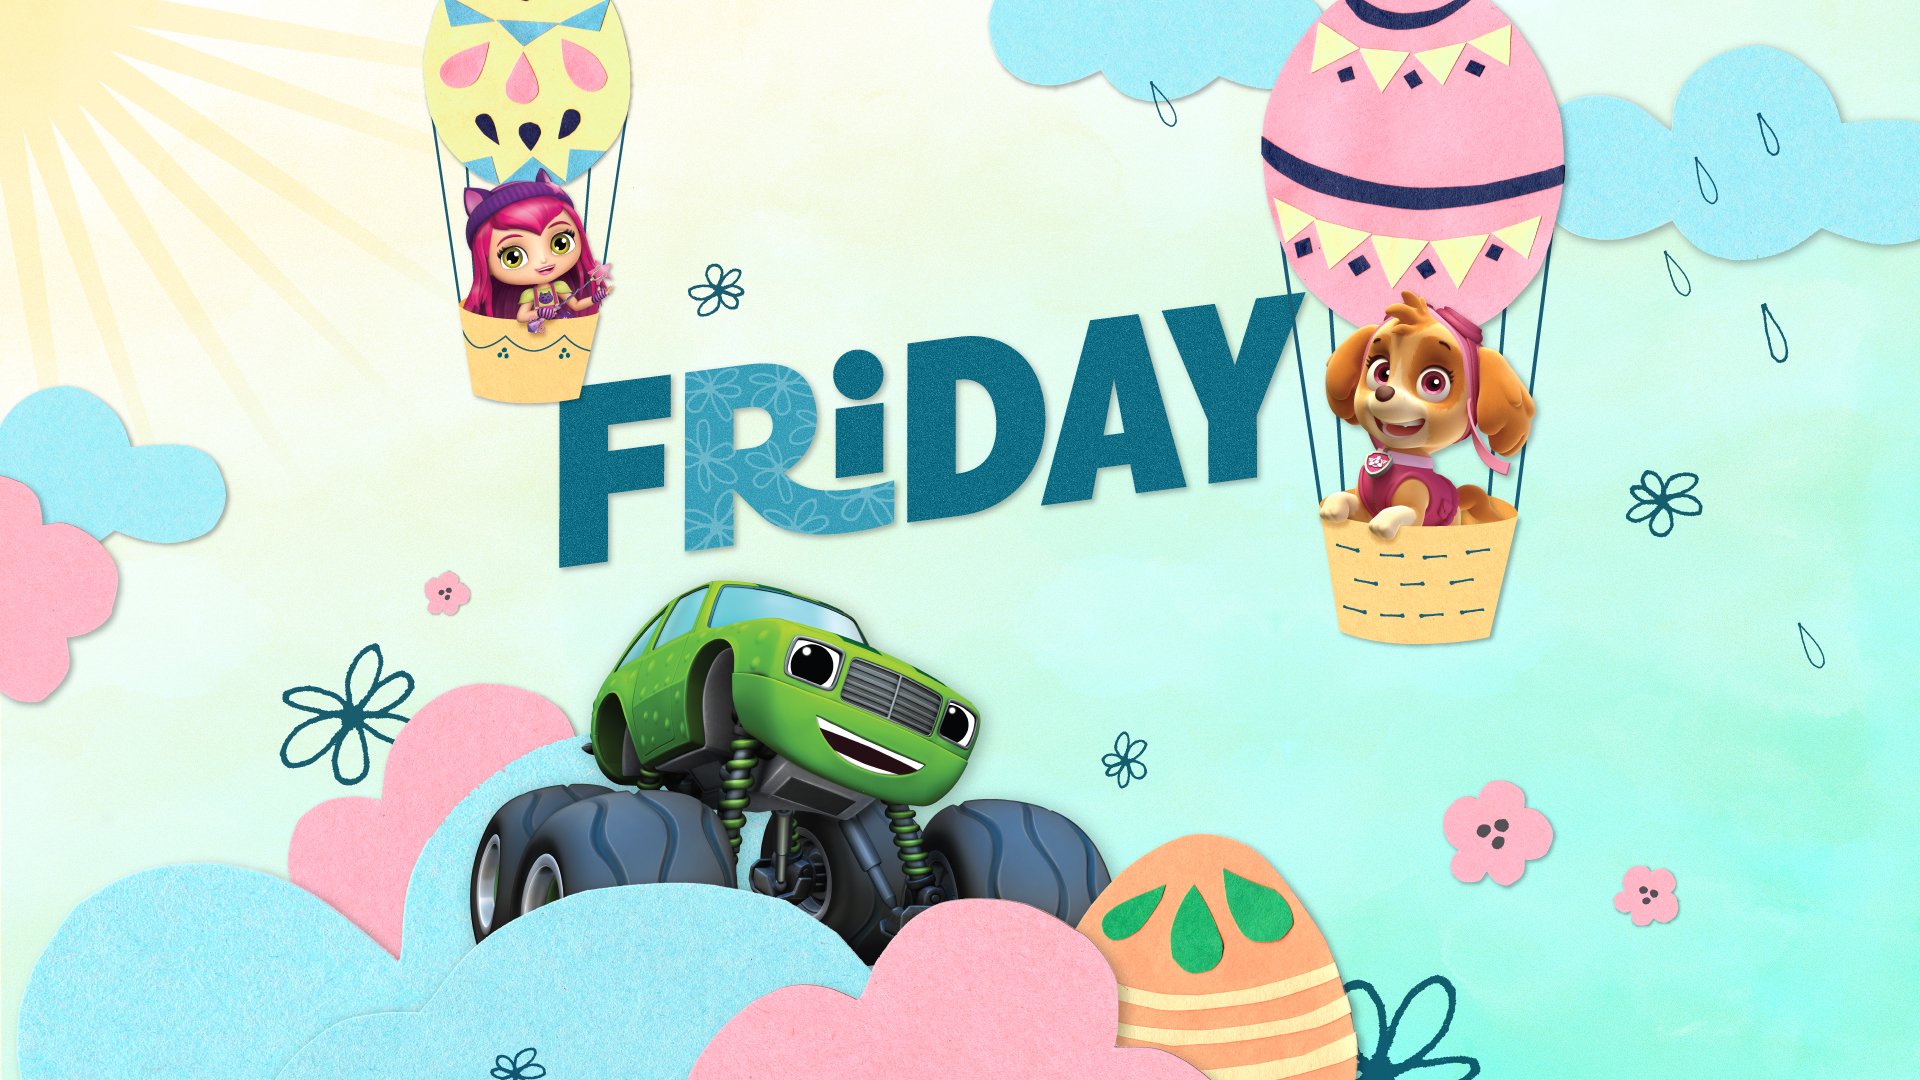 Easter_2015_Top-EndTags_Friday.jpg